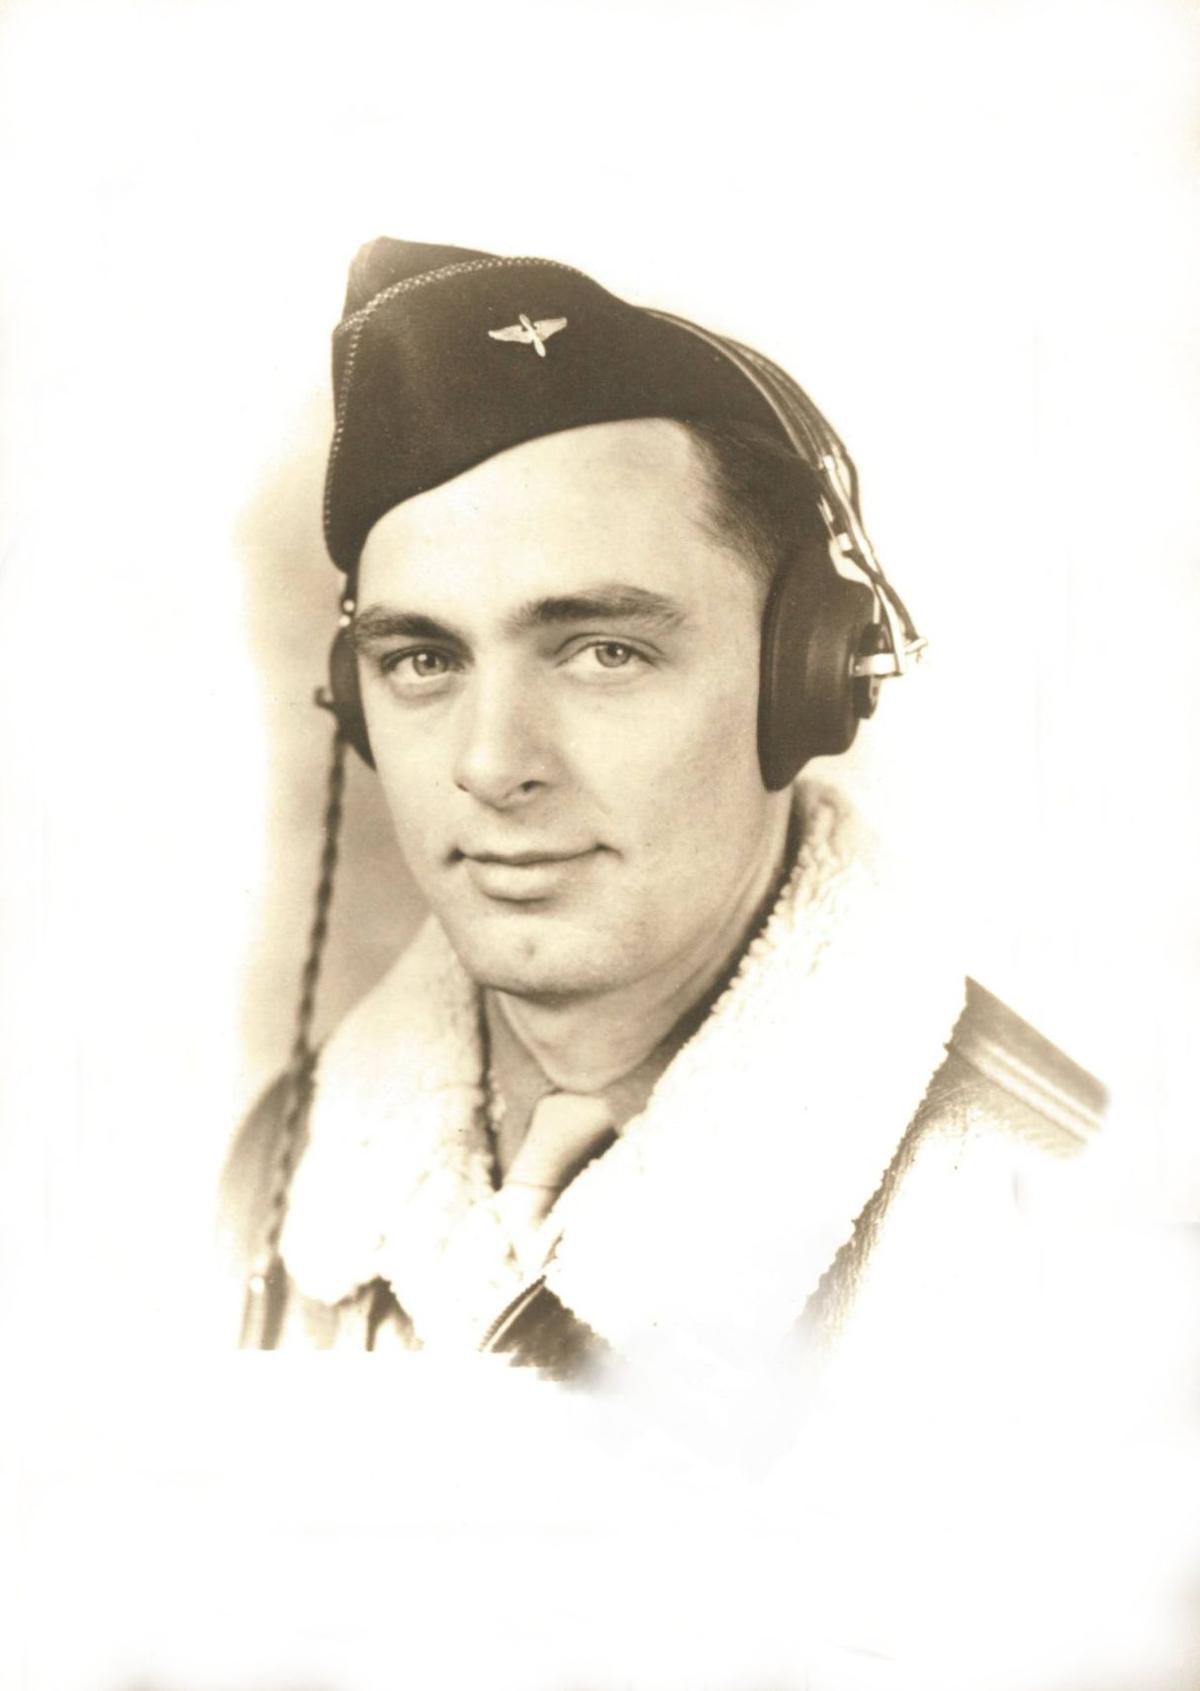 Everett military photo